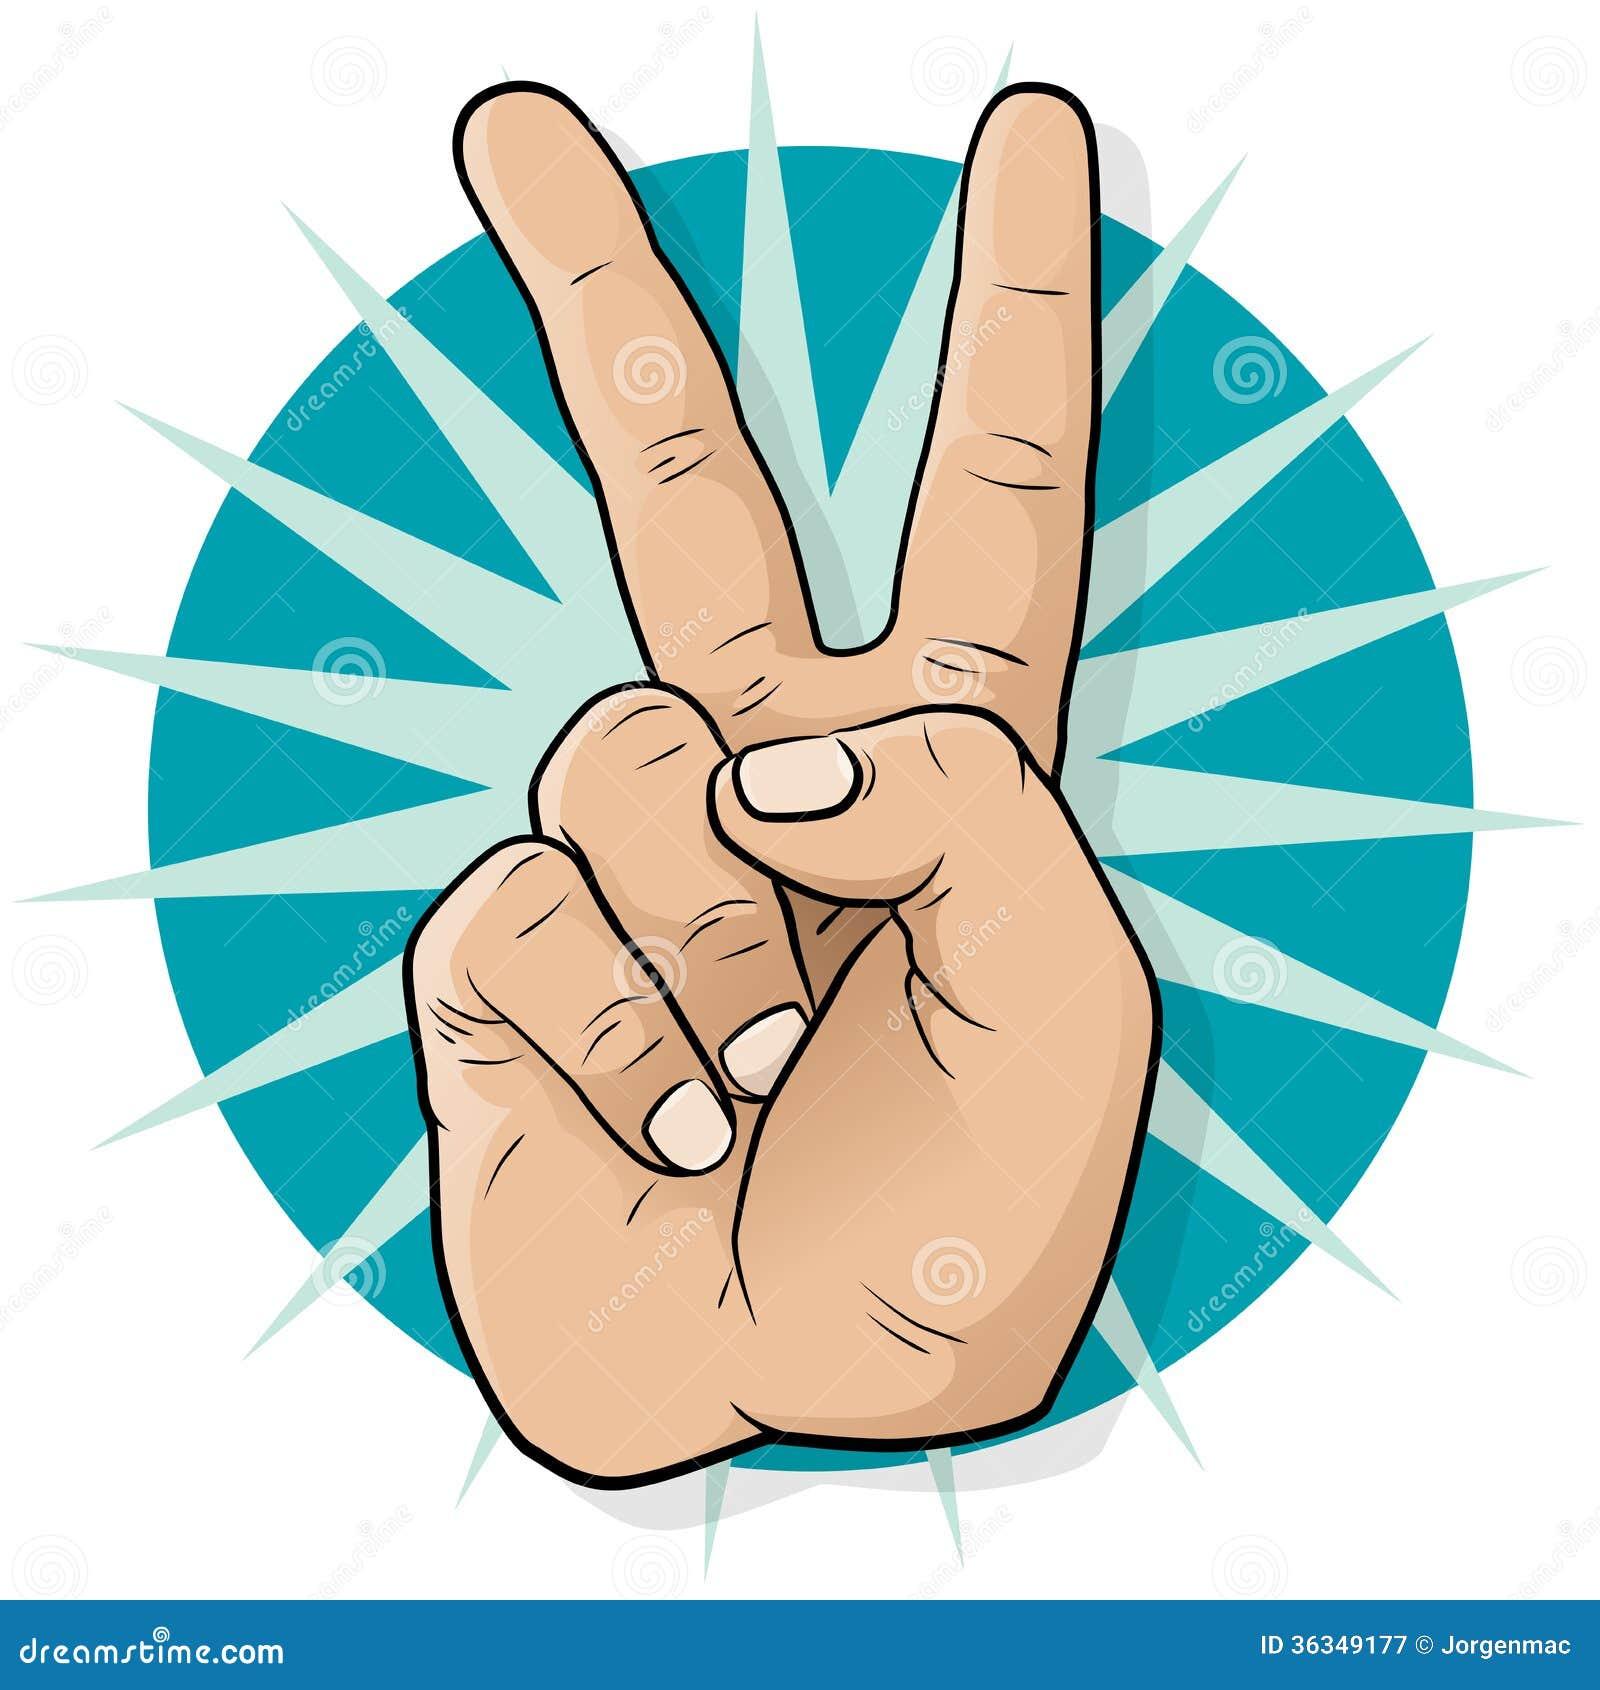 Pop Art Victory Hand Sign.